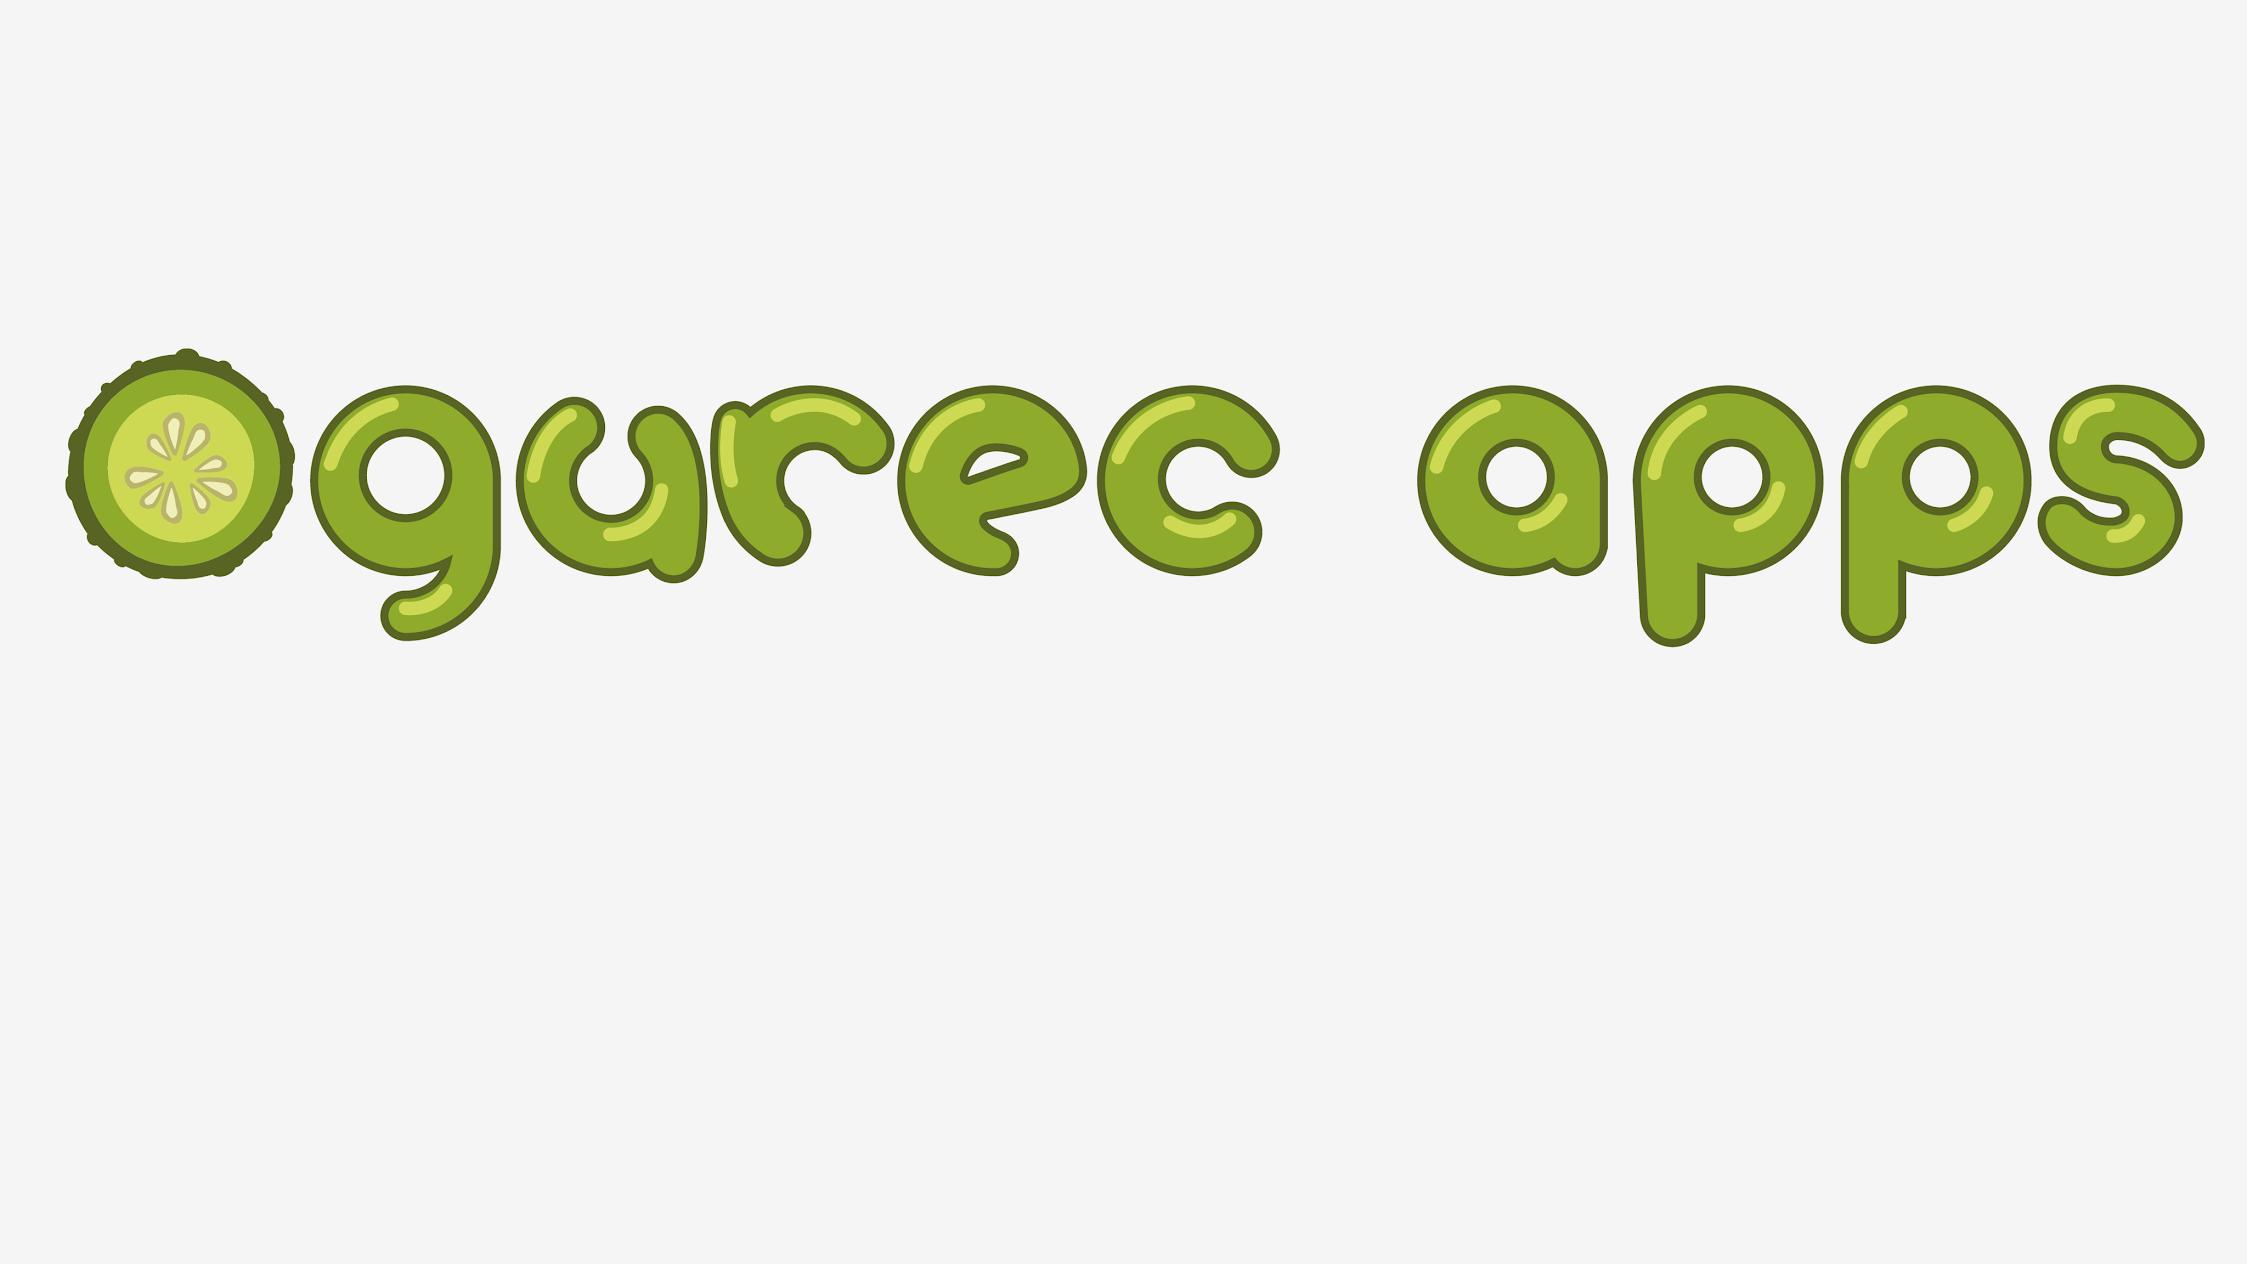 OGUREC APPS